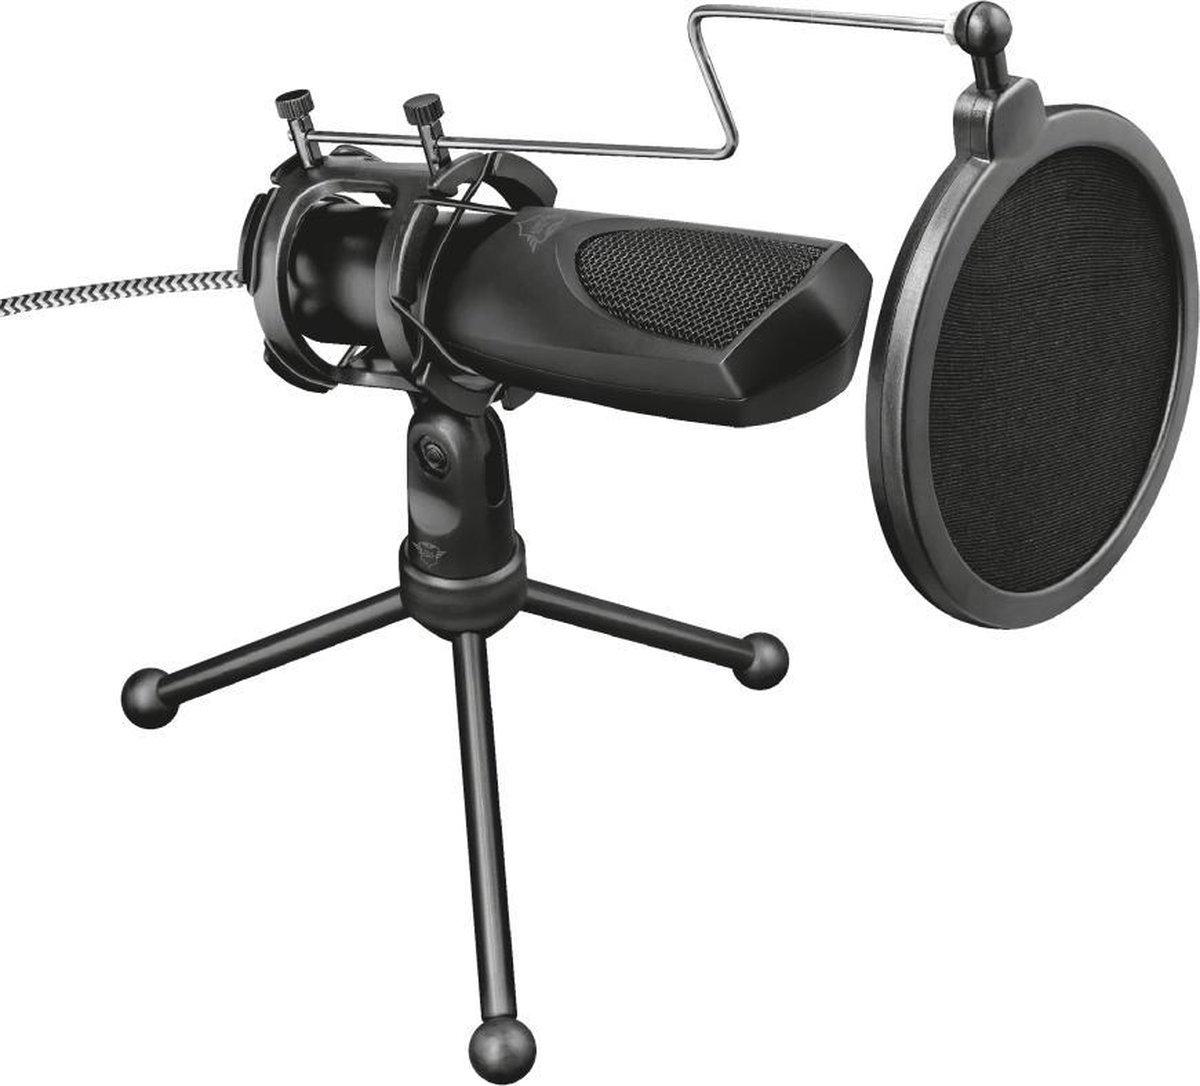 Trust GXT 232 Mantis - Microfoon - Gaming & Streaming - USB - Zwart - PS5